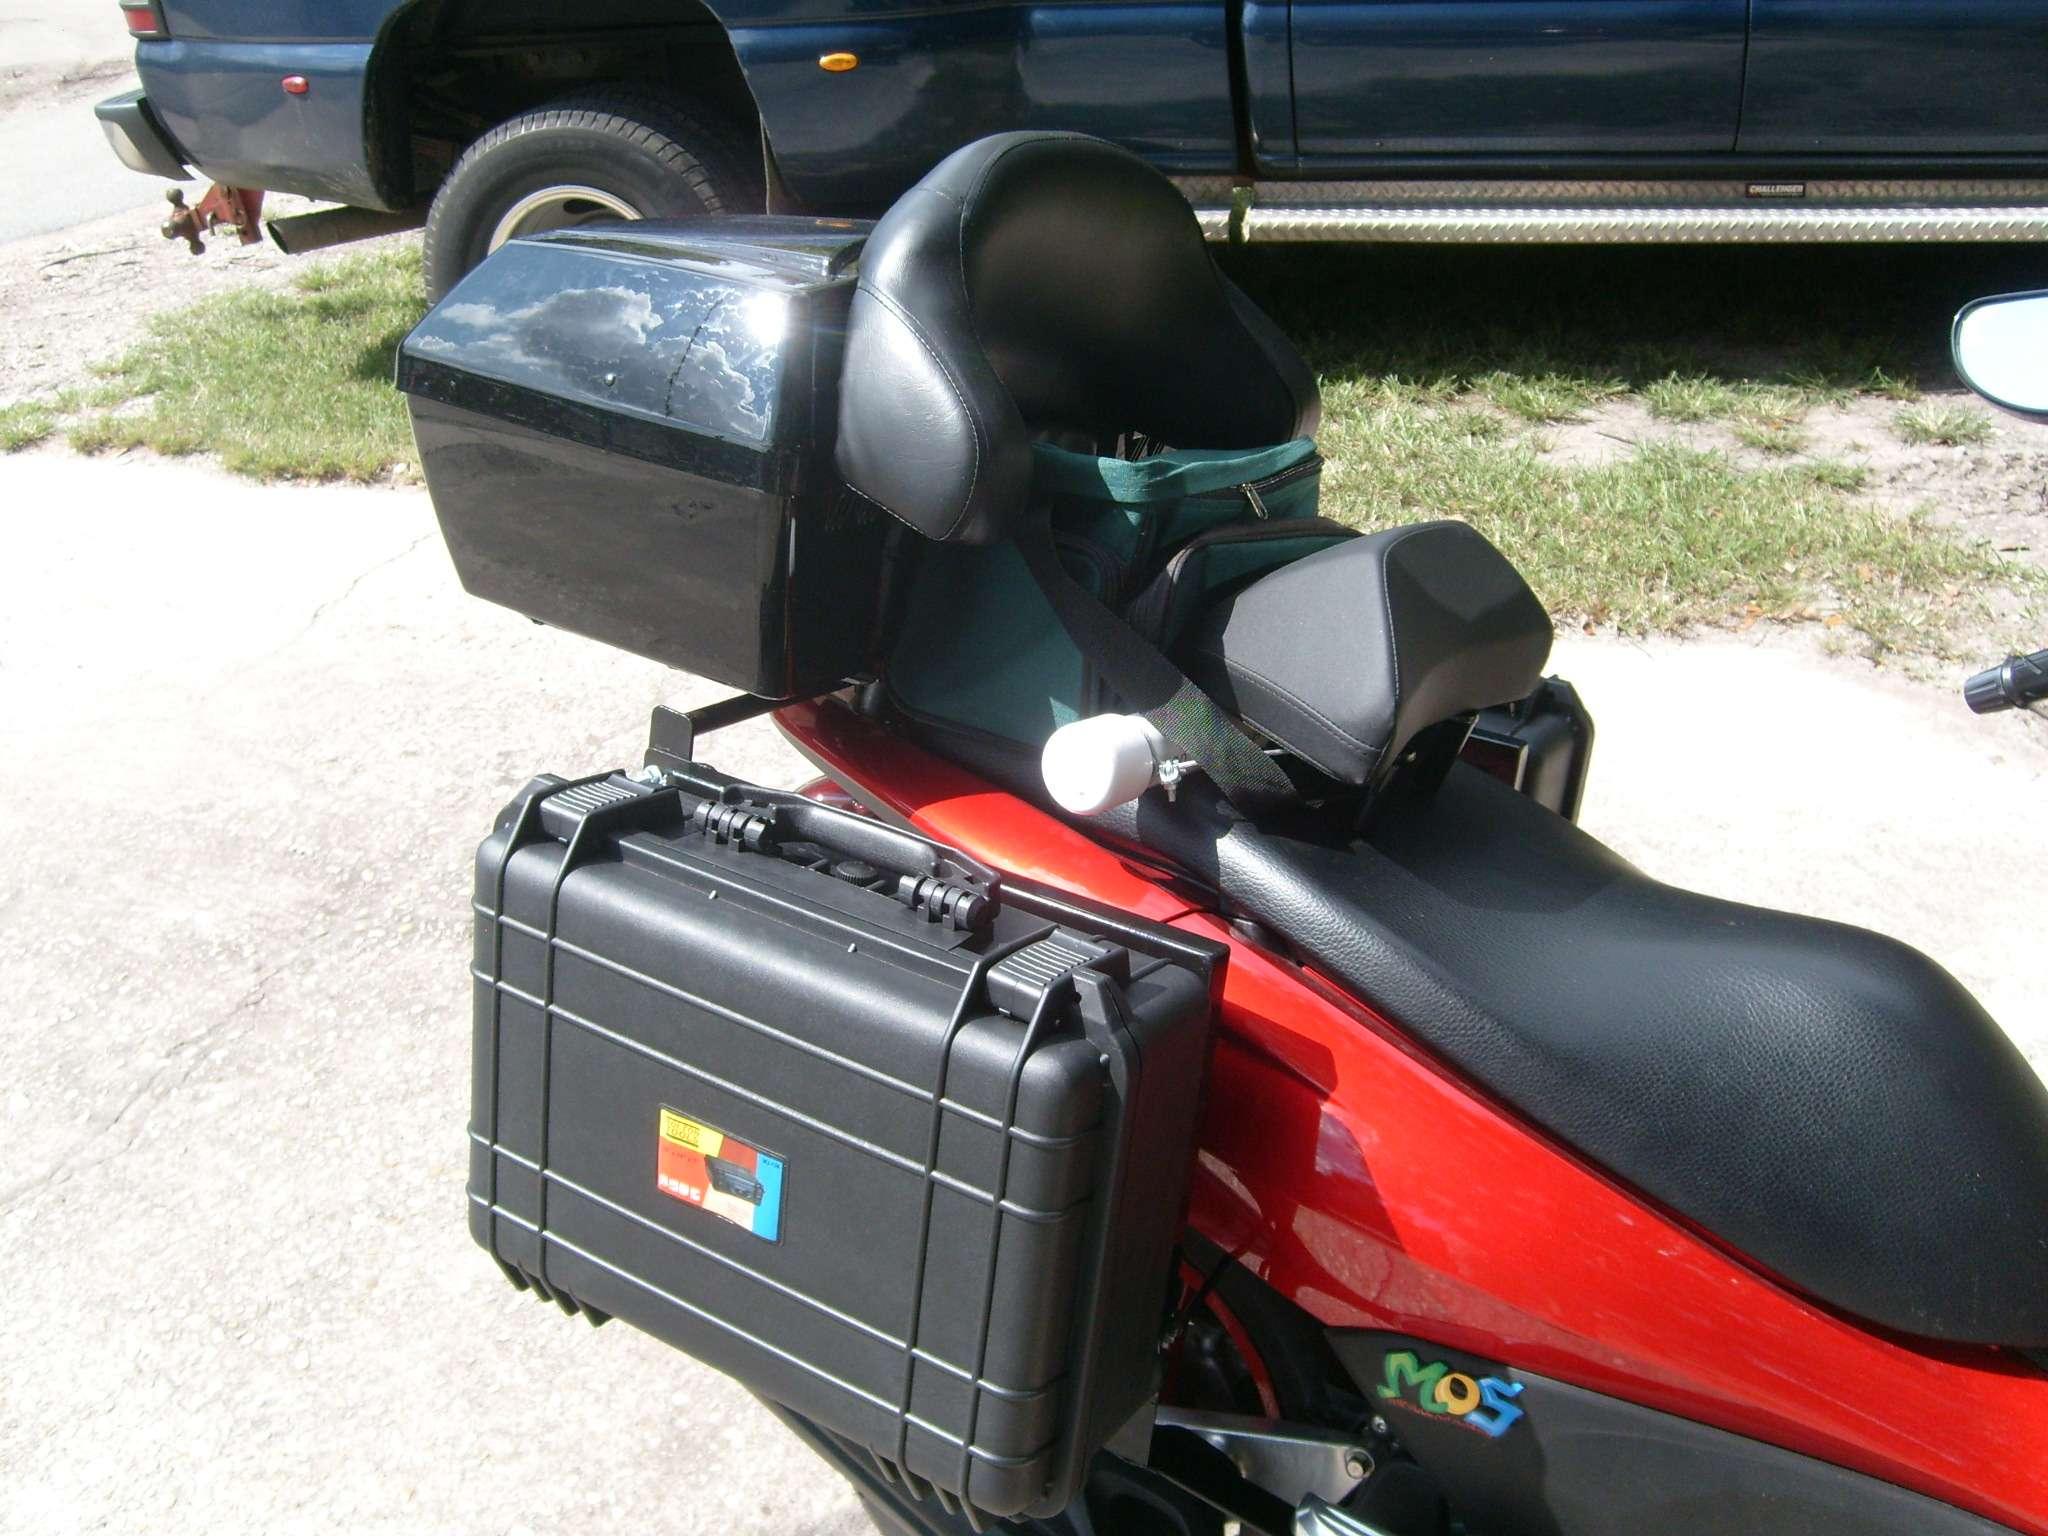 Seems like a long time - The Honda PCX / Forza / ADV150